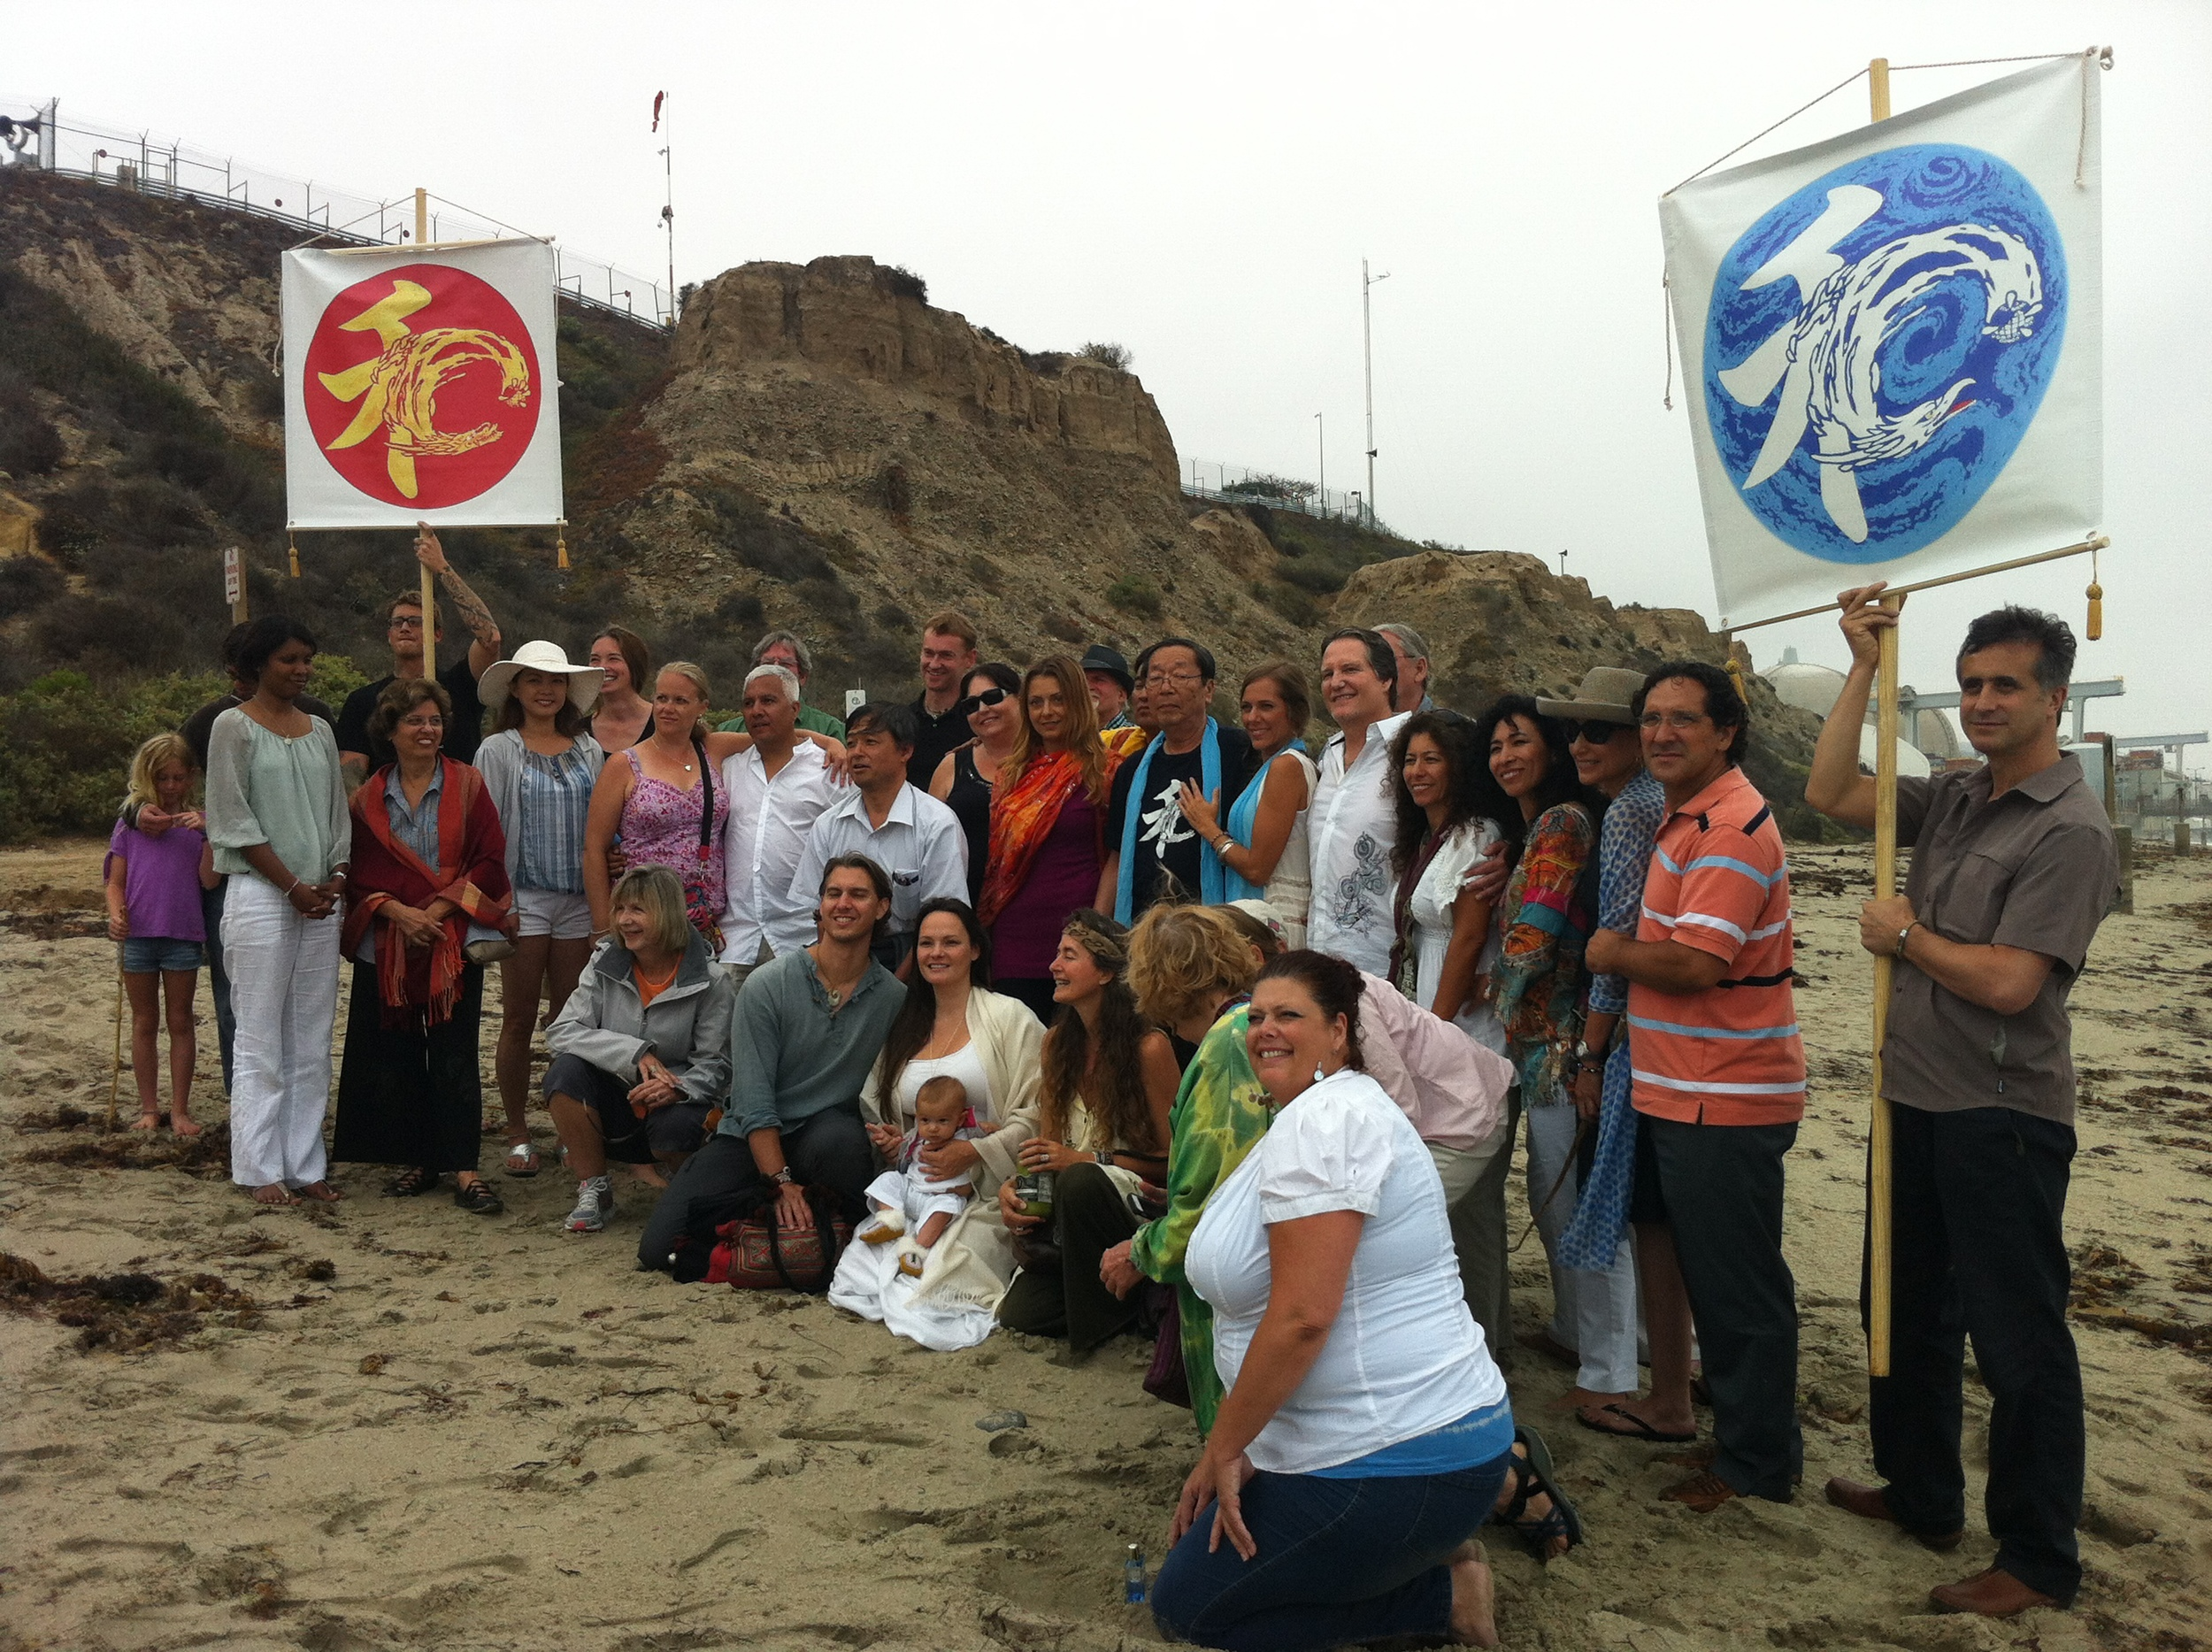 Dr. Emoto And Gary Christmas at San Onofre Beach California